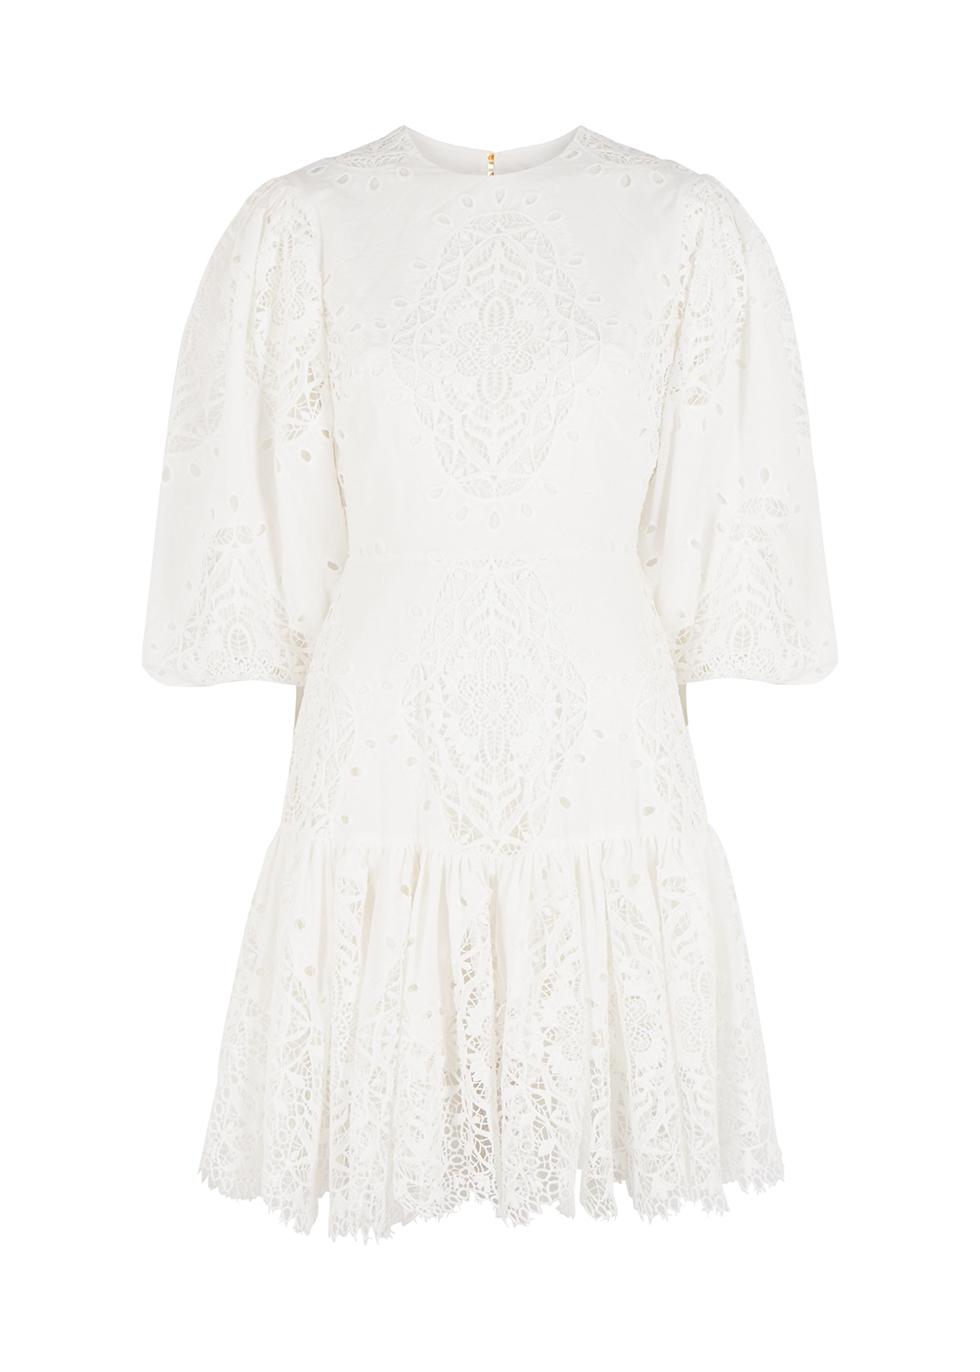 Tabitha white guipure lace mini dress